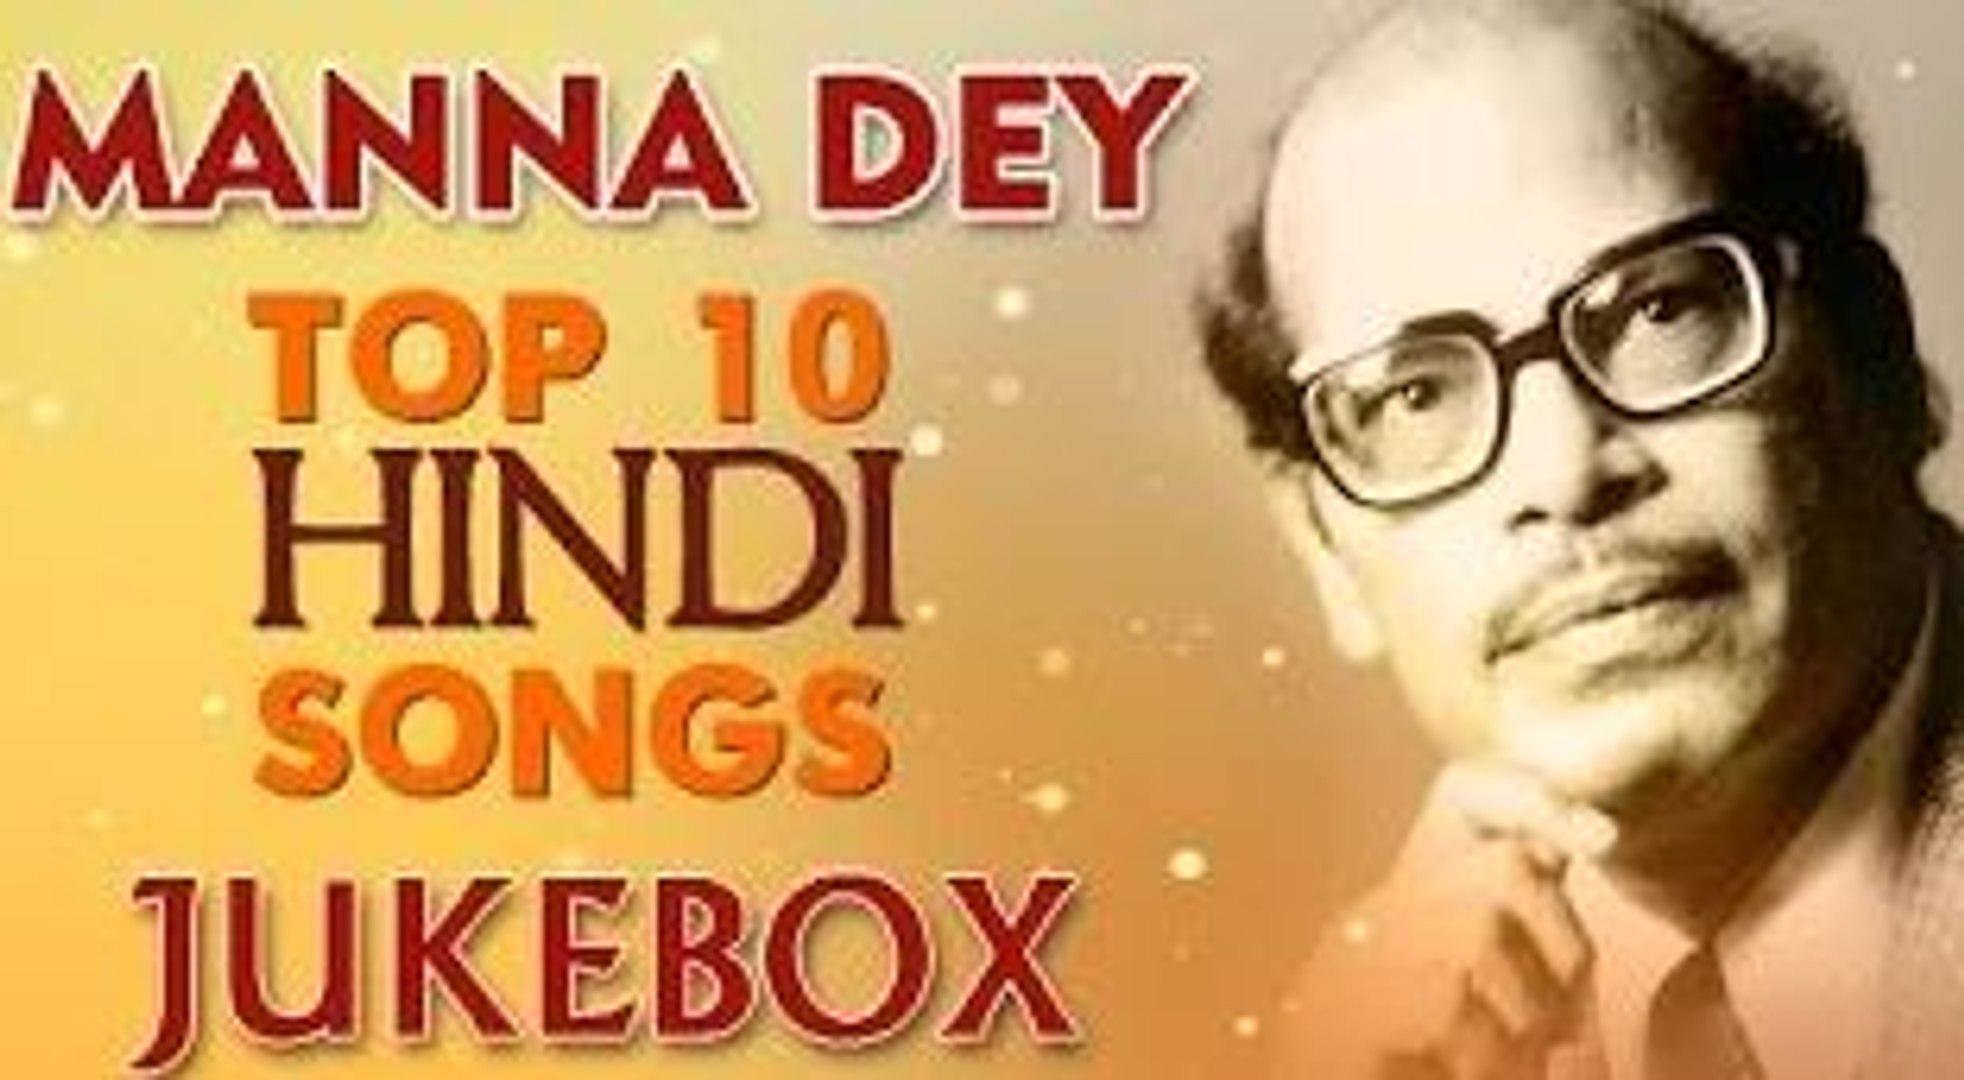 Manna Dey Hindi Songs Top 10 Hits Jukebox Classic Old Hindi Songs Video Dailymotion Top hindi song romantic punjabi songs jukebox 2020 special bollywood romantic jukebox. manna dey hindi songs top 10 hits jukebox classic old hindi songs